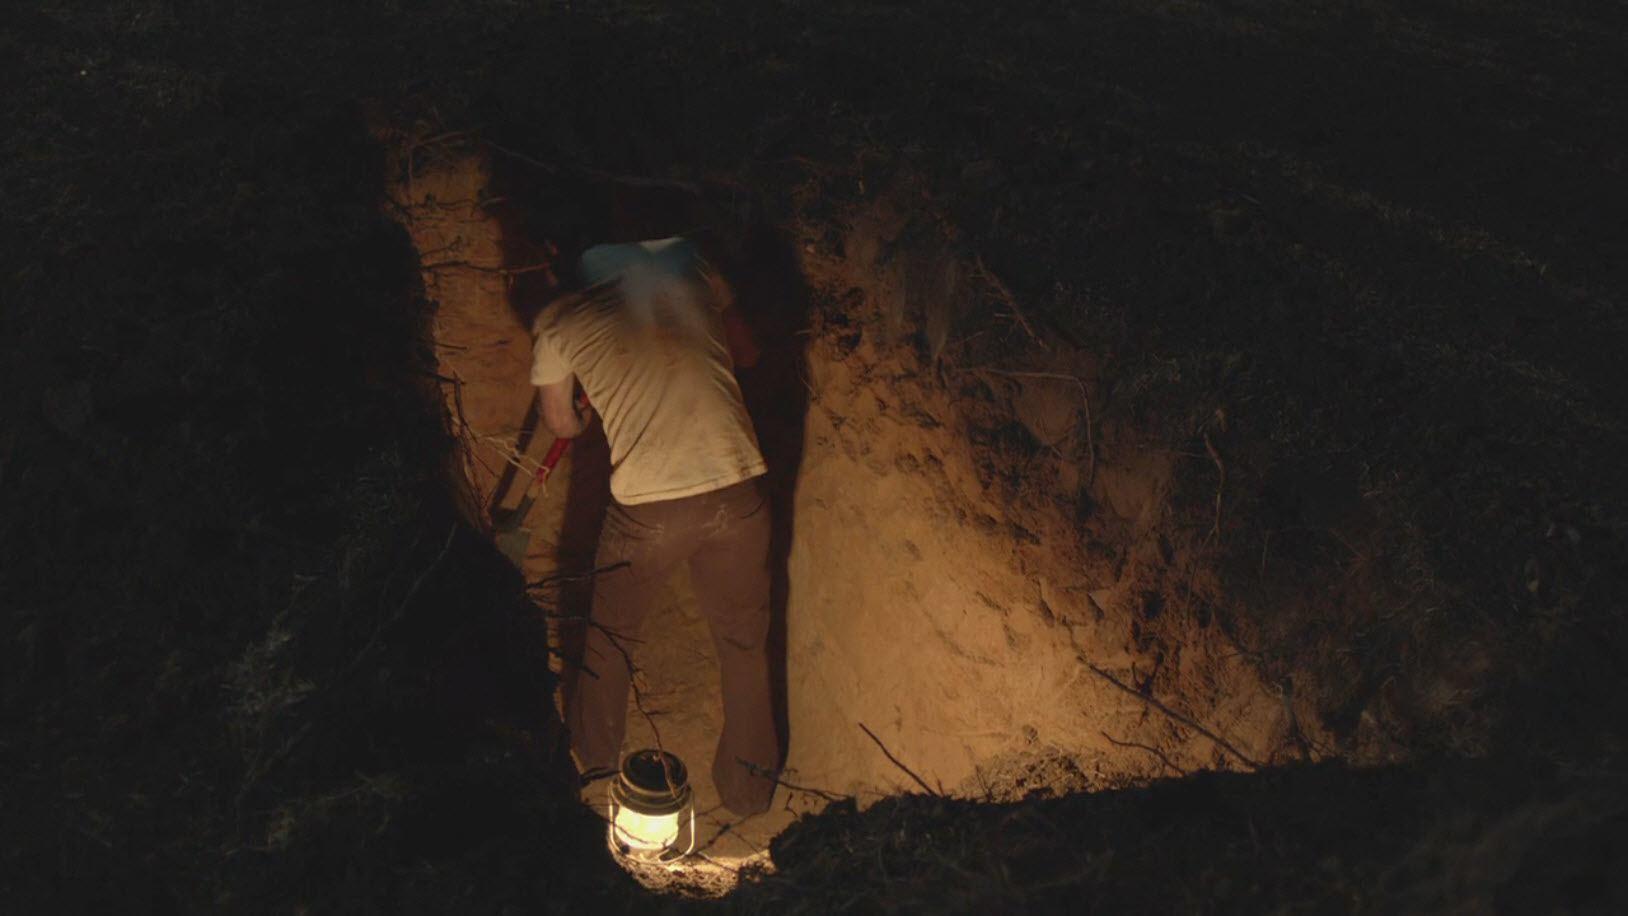 gordan clark digging hole in halt catch fire 2015 images